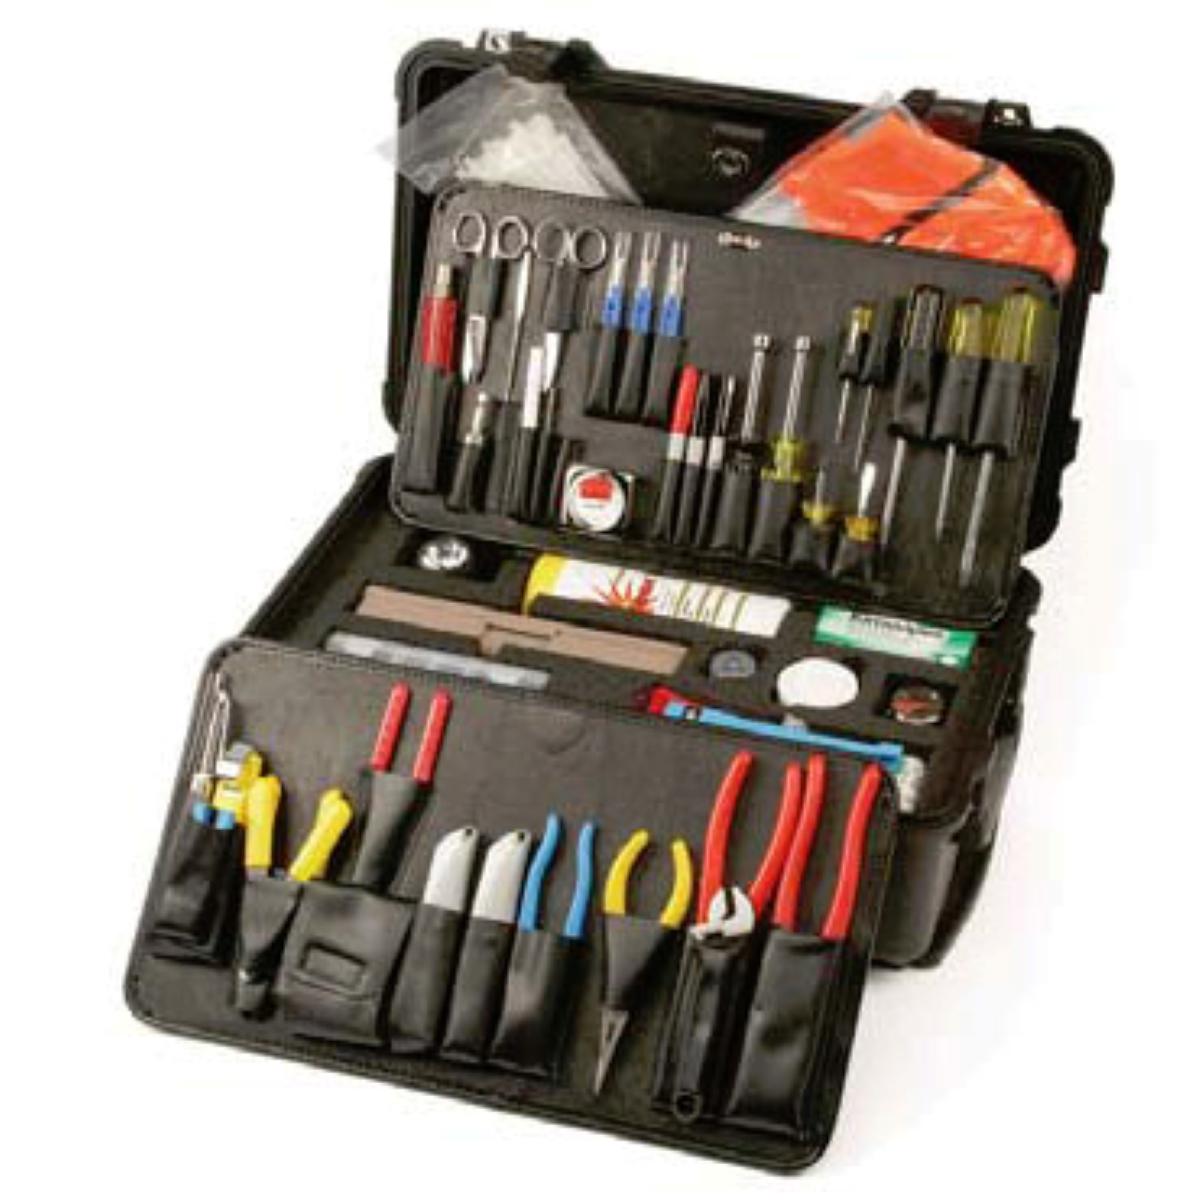 Kit de herramientas avanzado para profesionales de fibra CORNING TKT-FIBERTECH-PRO TKT-FIBERTECH-PRO